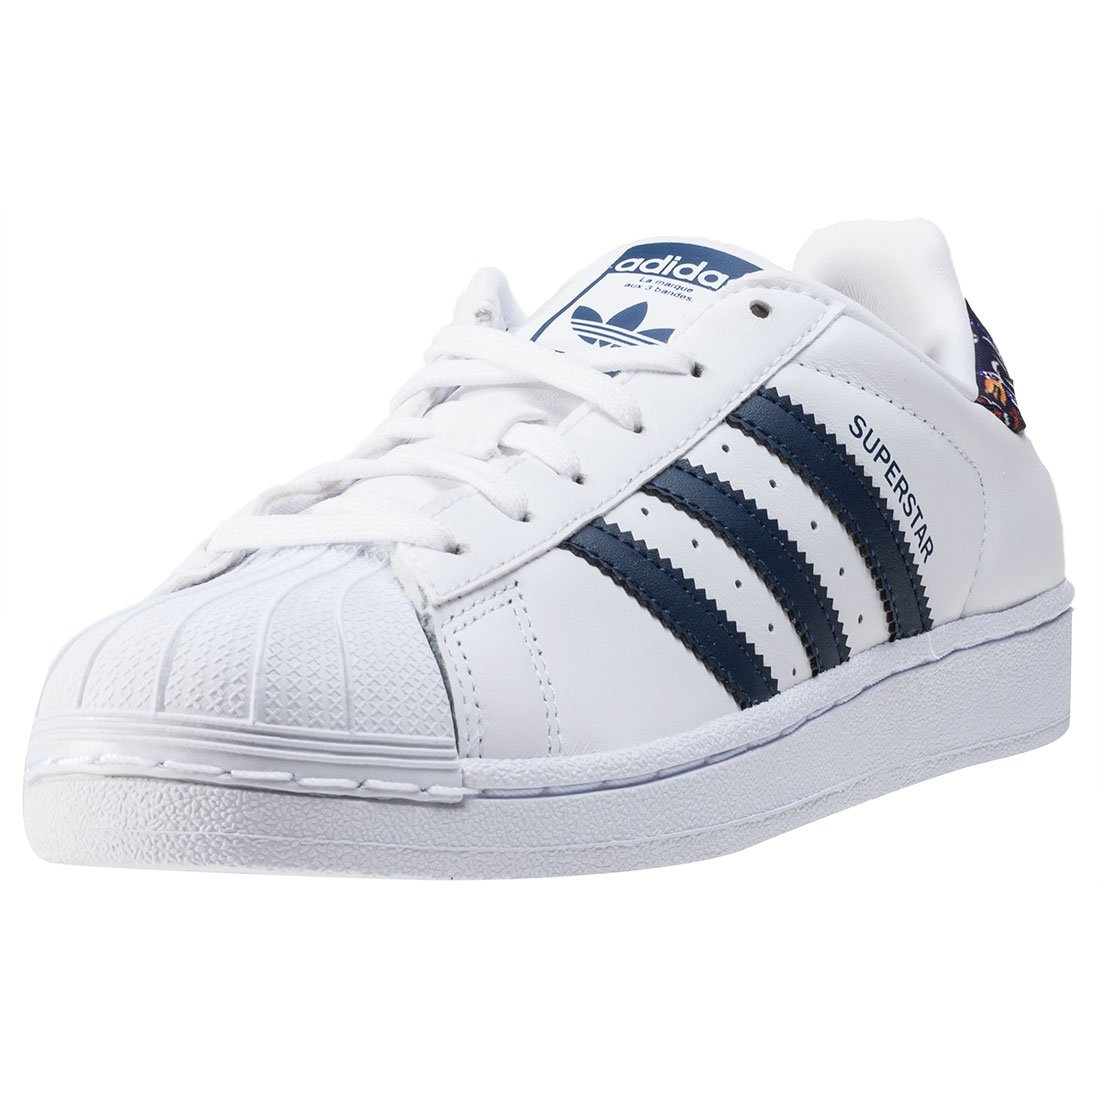 f944609b67 adidas Women s Superstar W FOOTWEAR WHITE STDARS FOOTWEAR WHITE/STDARS 7.5  B(M) US: Amazon.in: Shoes & Handbags